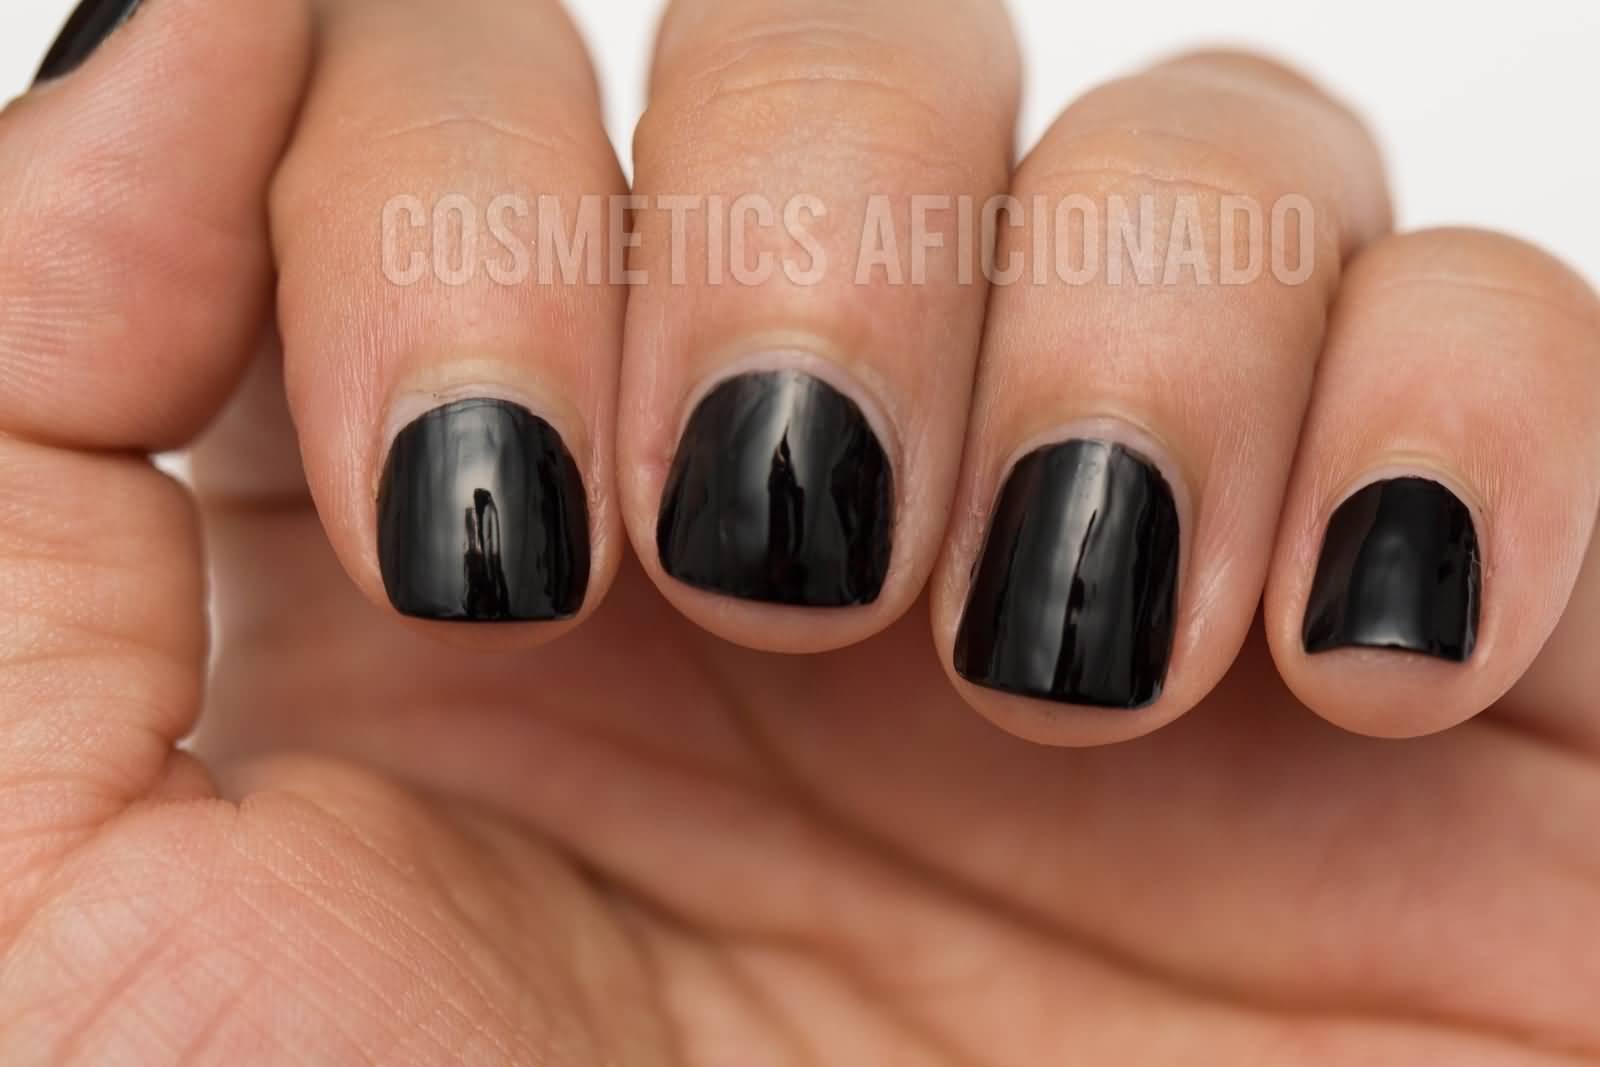 Simple Full black Acrylic Short Nail Design